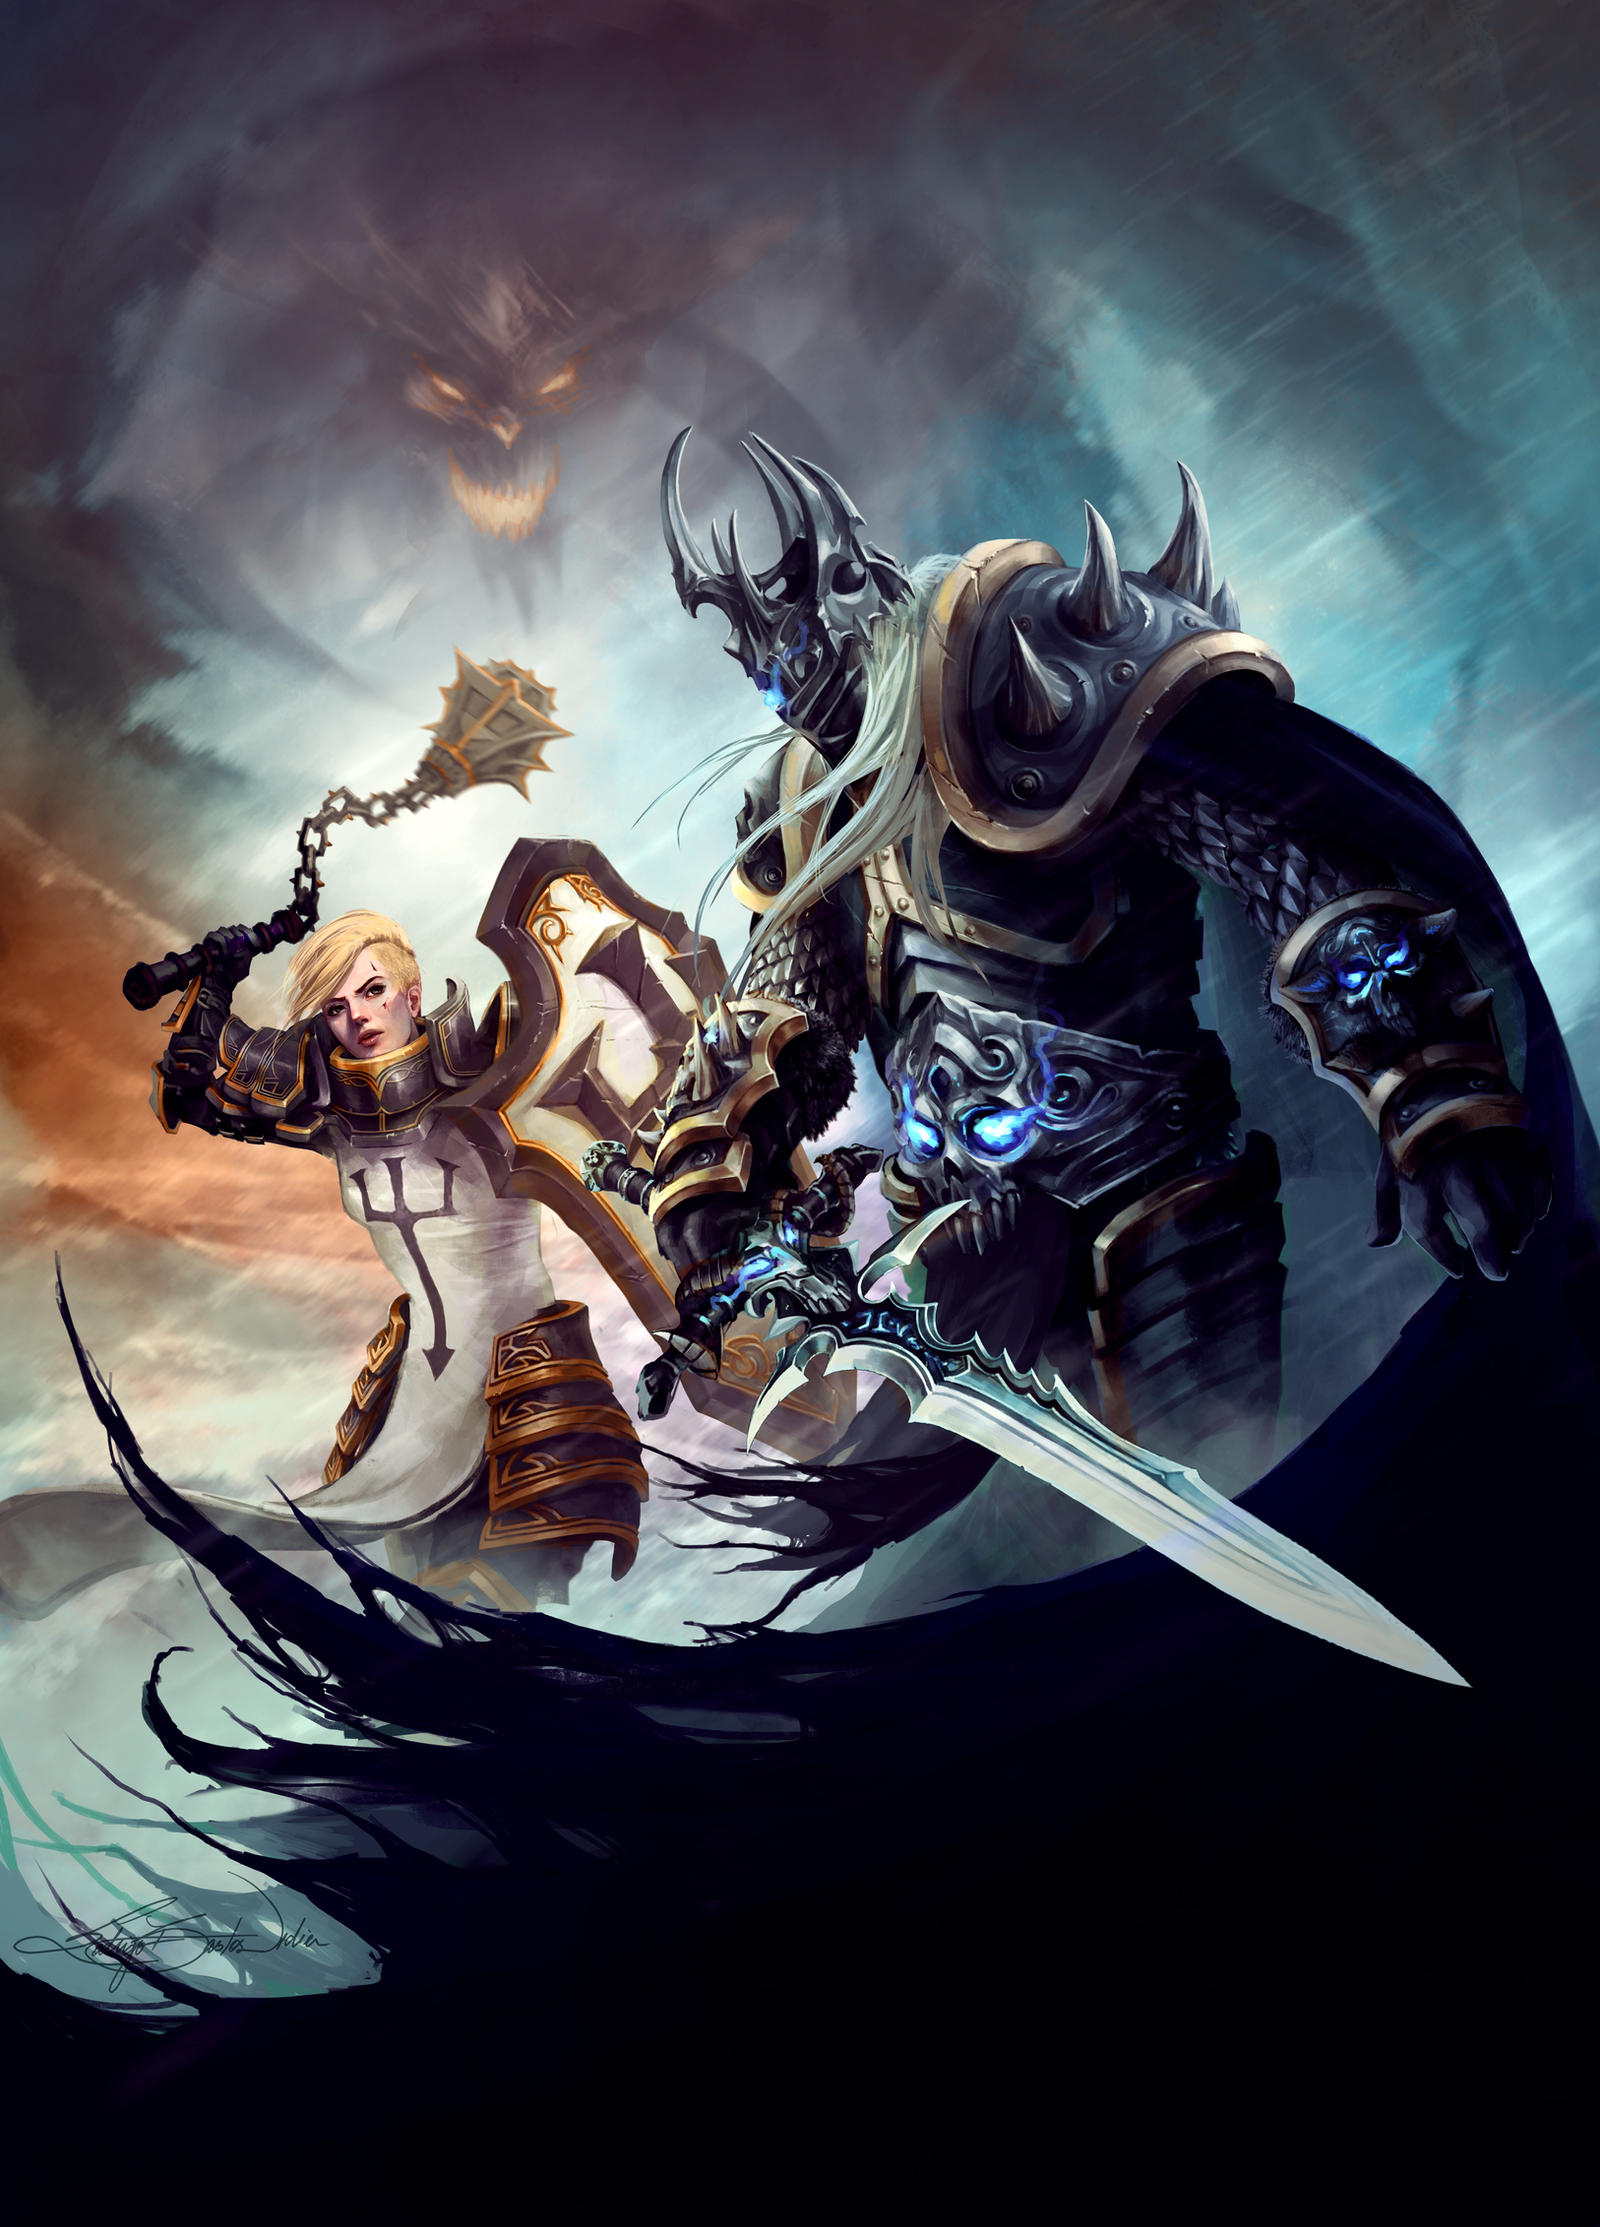 Heroes of The Storm - Johanna and Arthas by RodrigoBastos